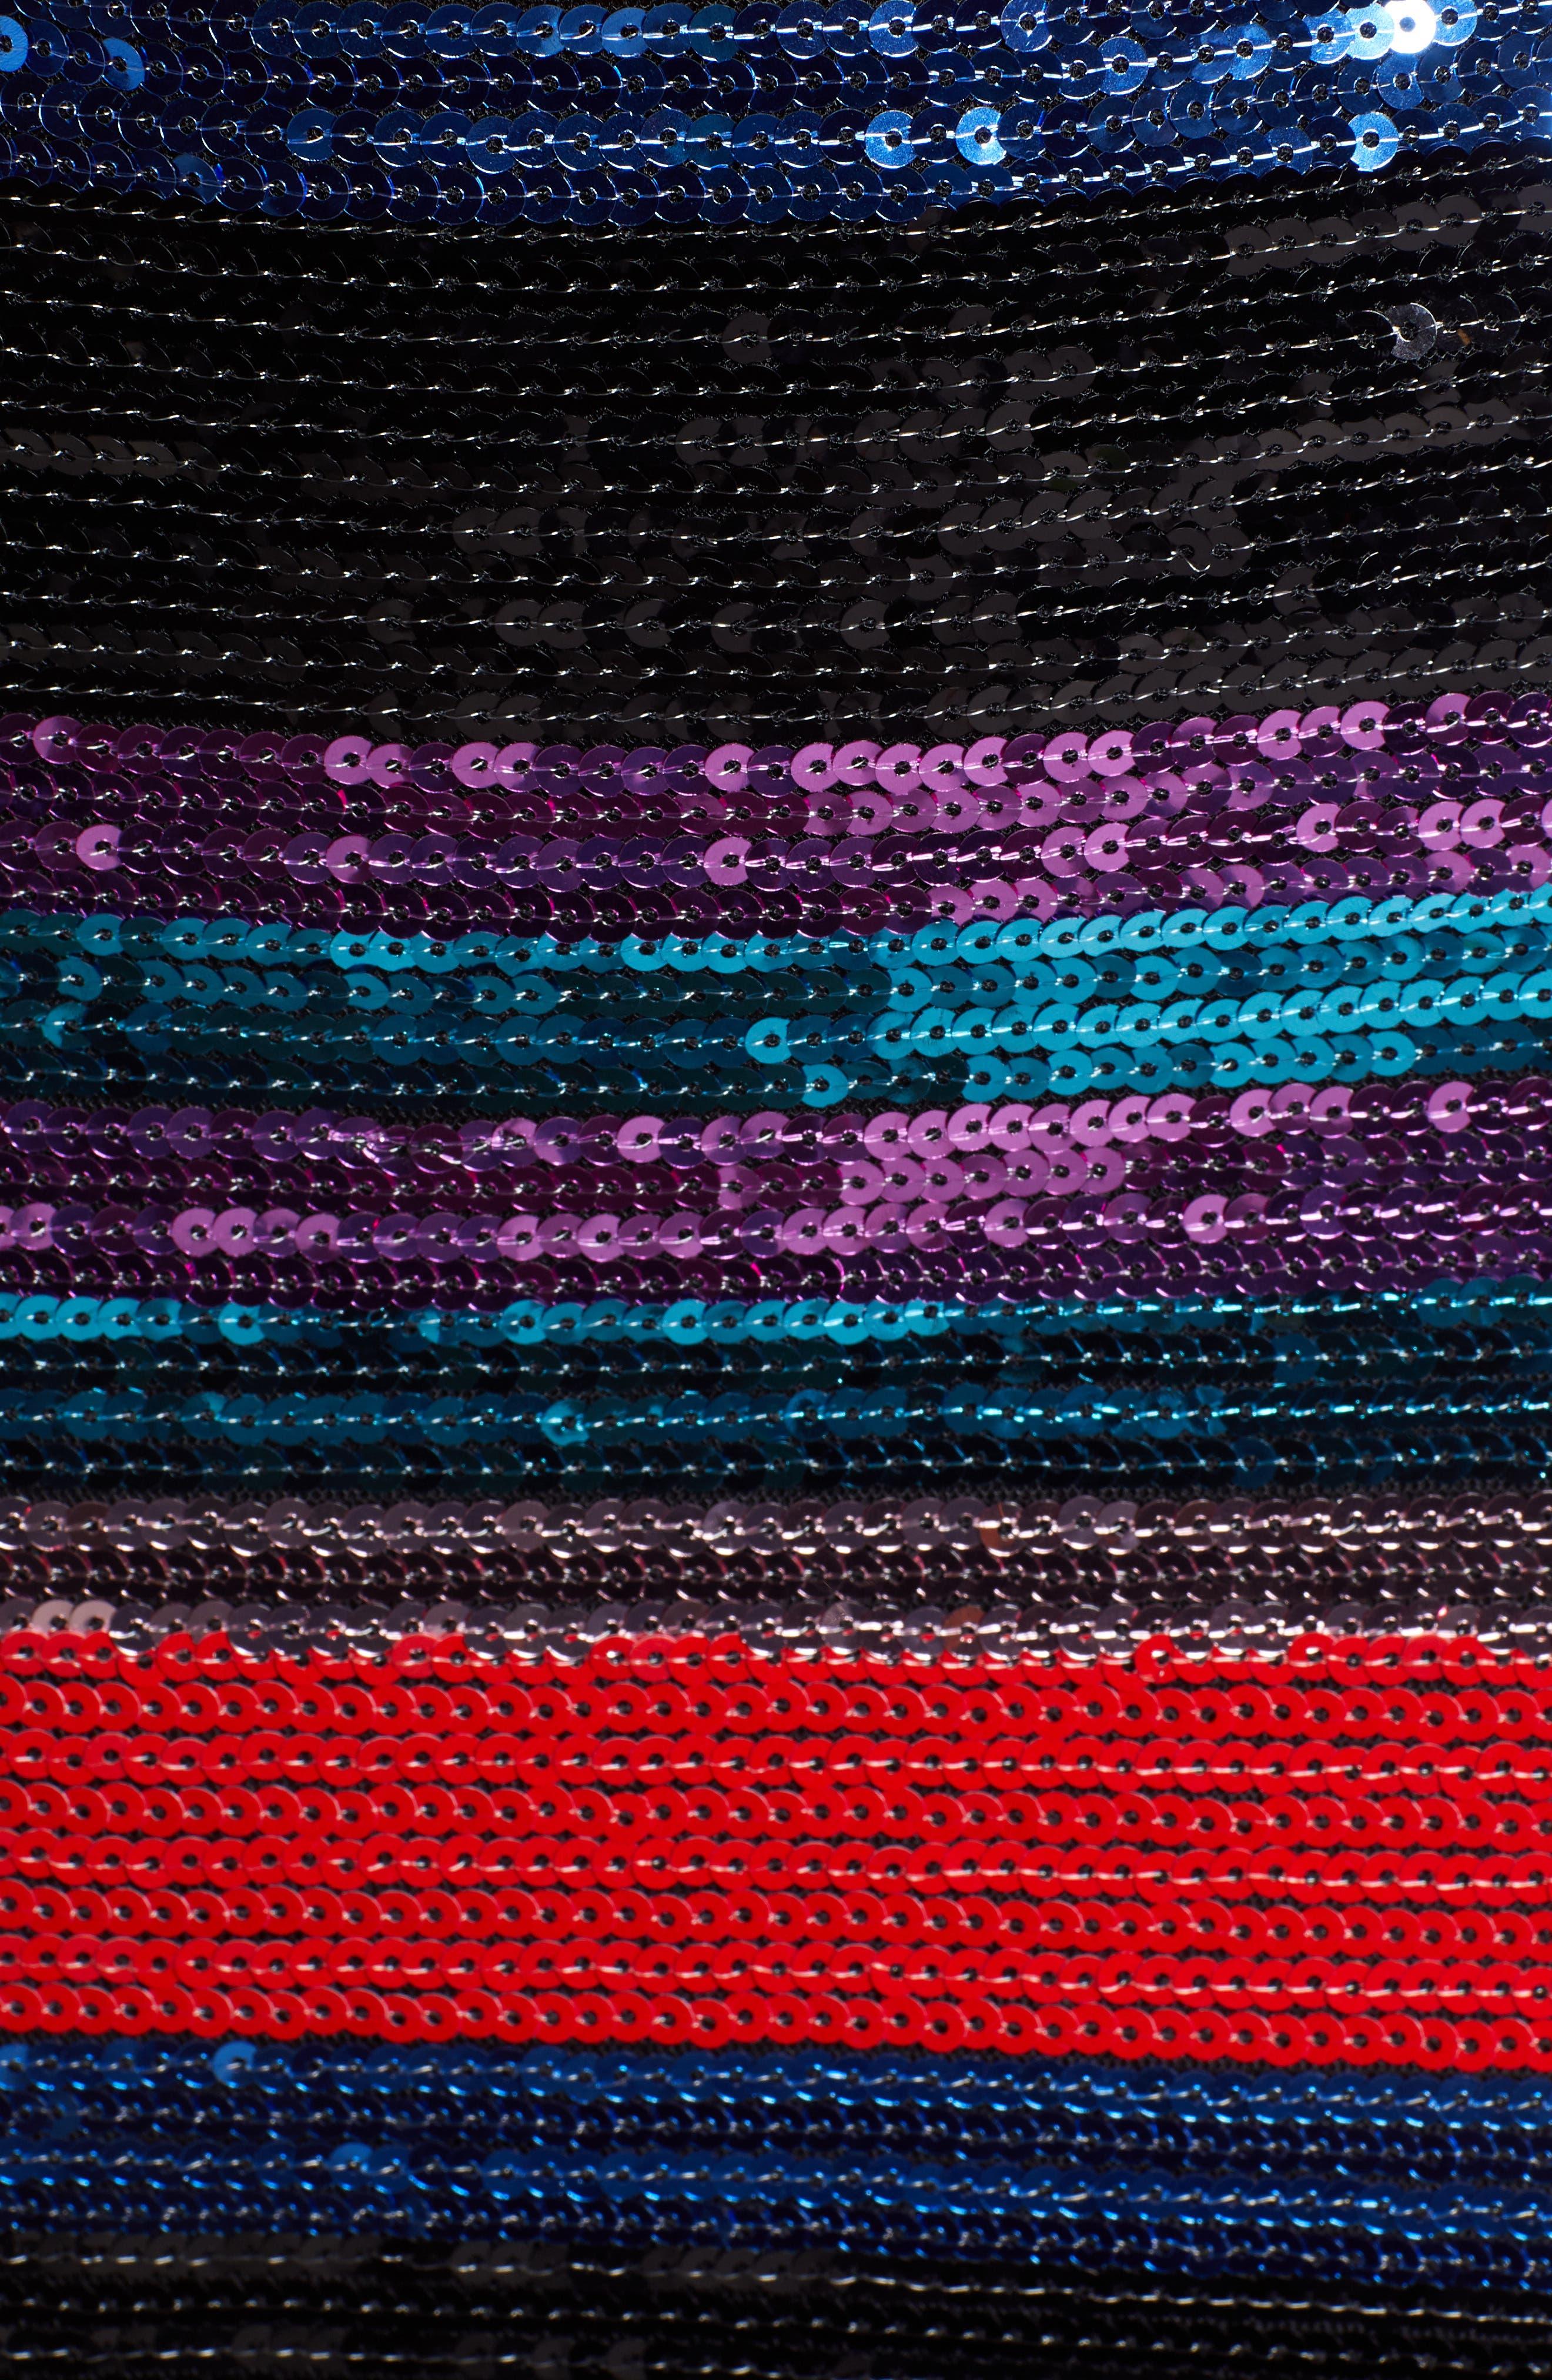 Manfi Lace-Up Back Sequin Stripe Minidress,                             Alternate thumbnail 6, color,                             RED SEQUIN STRIPE